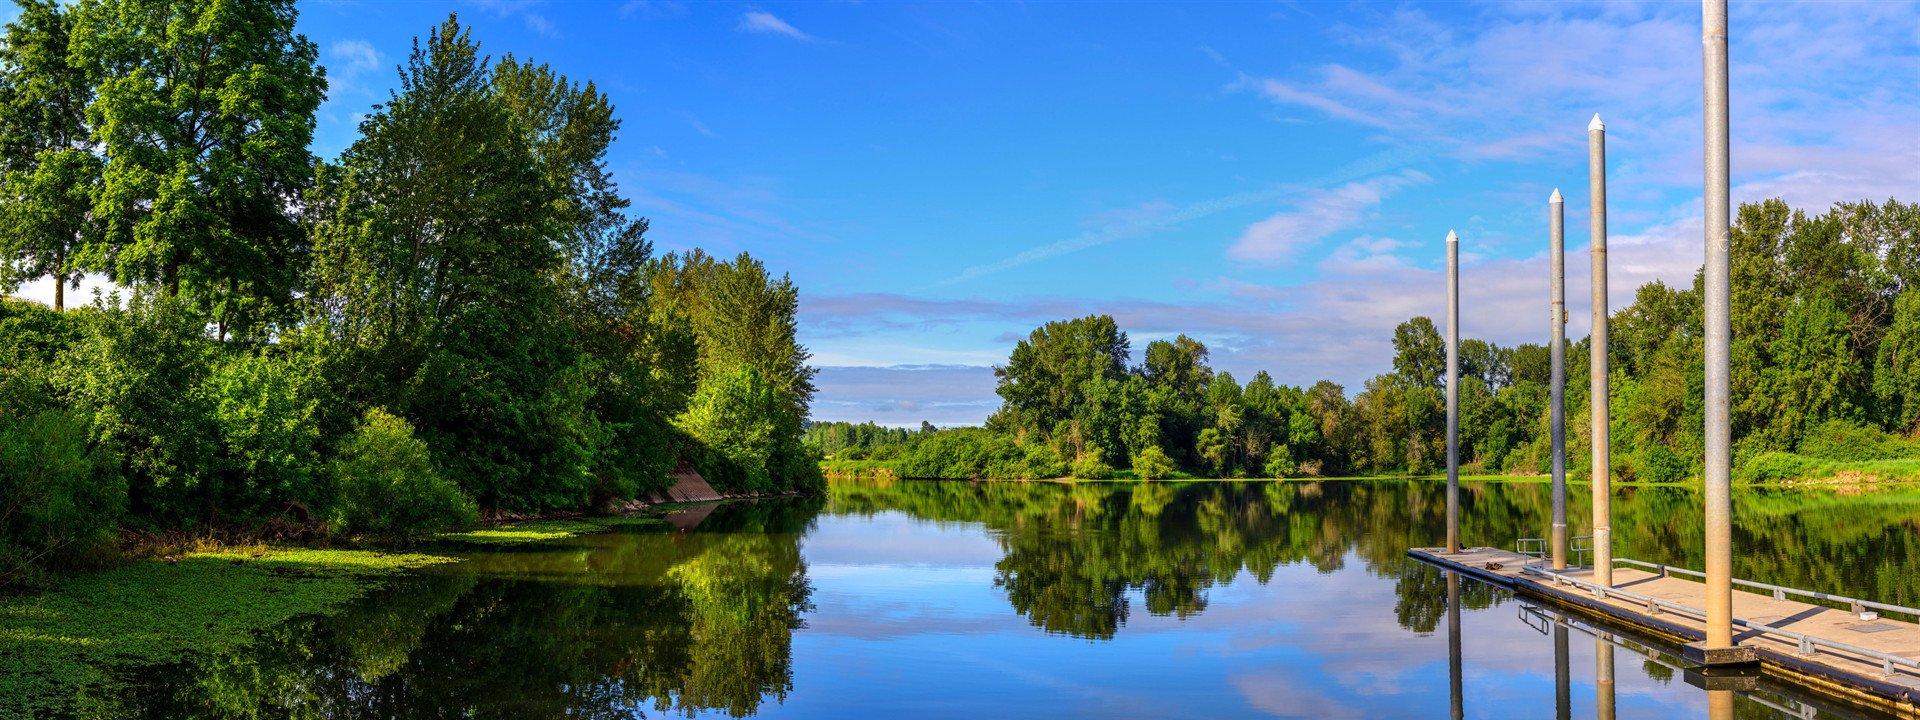 Grief & Healing | Restlawn Funeral Home & Memory Gardens